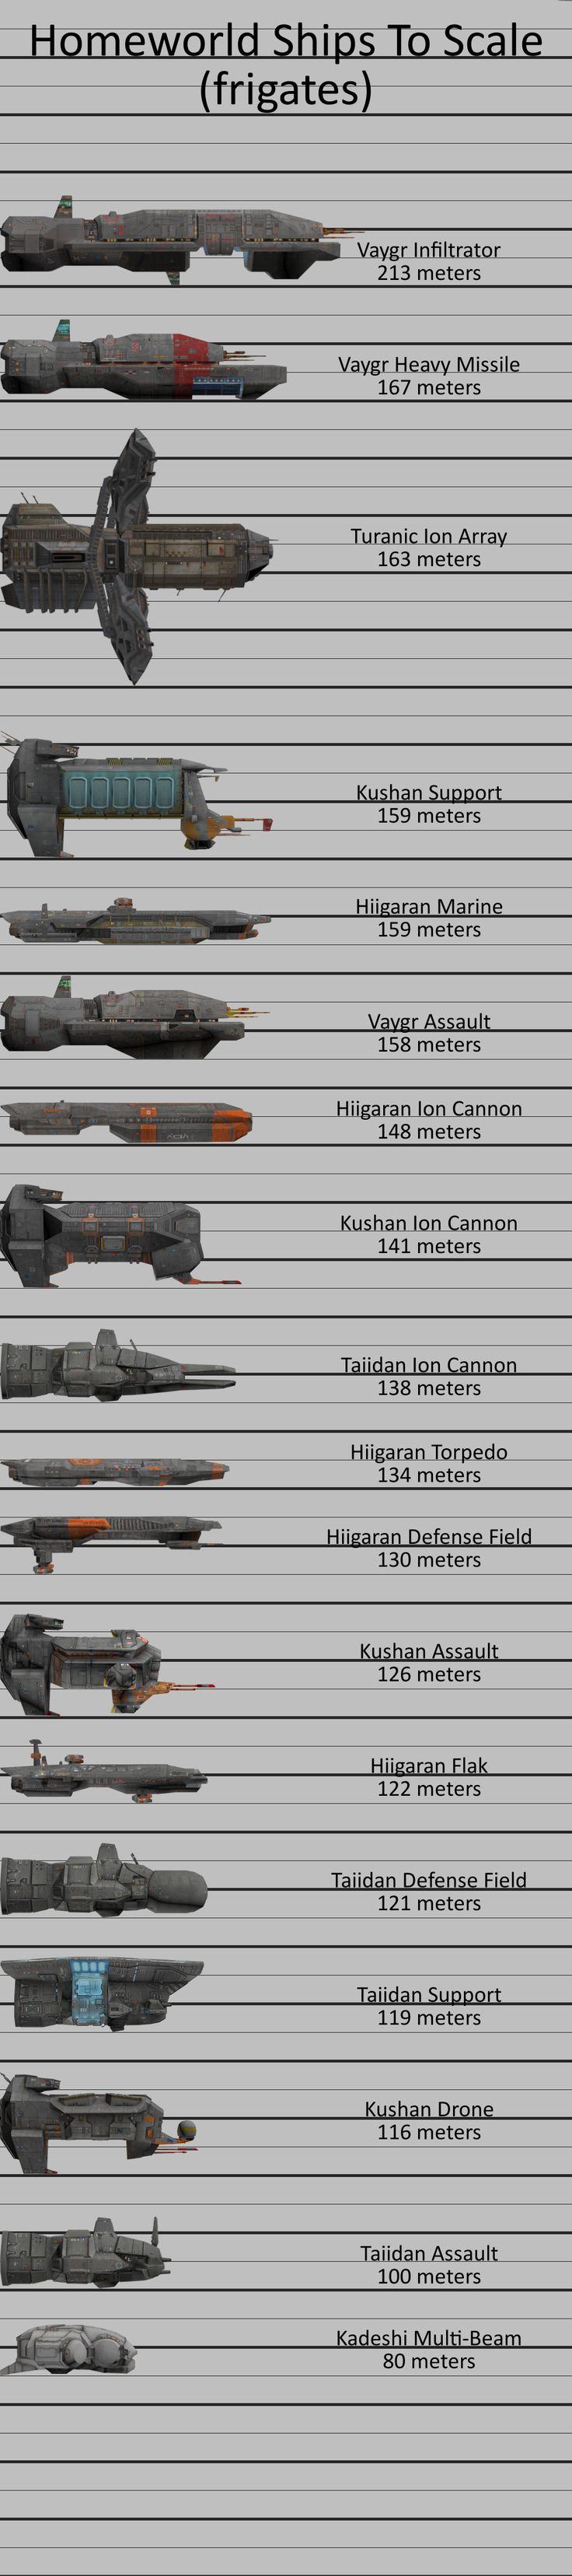 Homeworld Ships To Scale (frigates) by doberman211